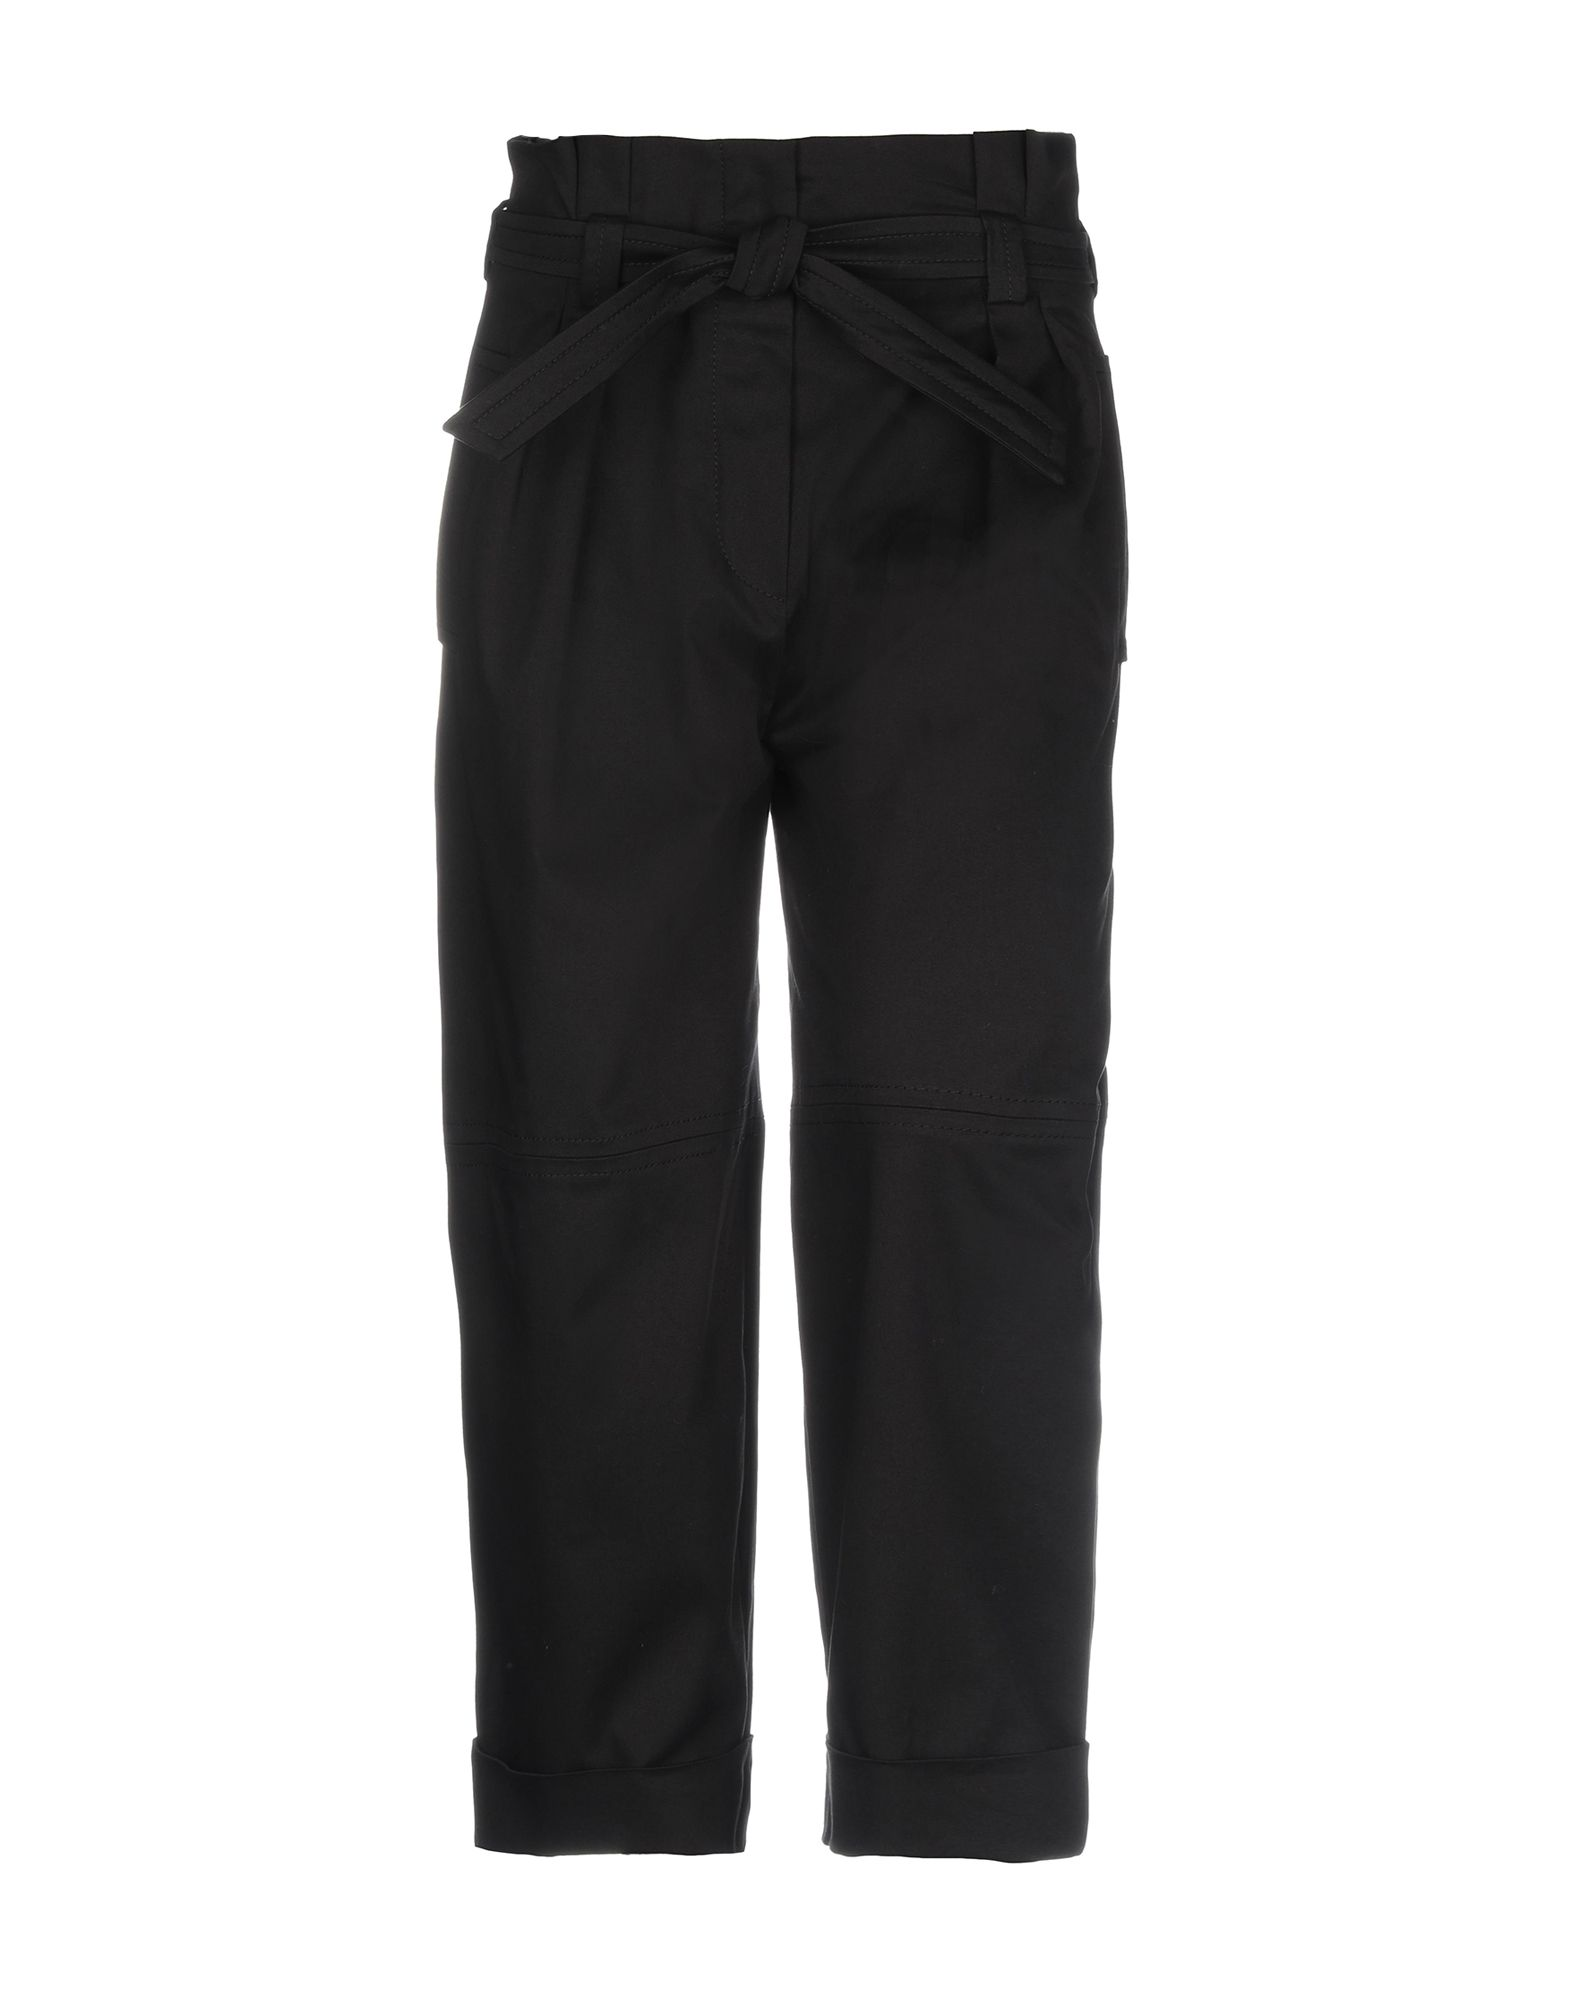 Pantalone Alberta Alberta Ferretti donna - 13236543MB  Online einkaufen